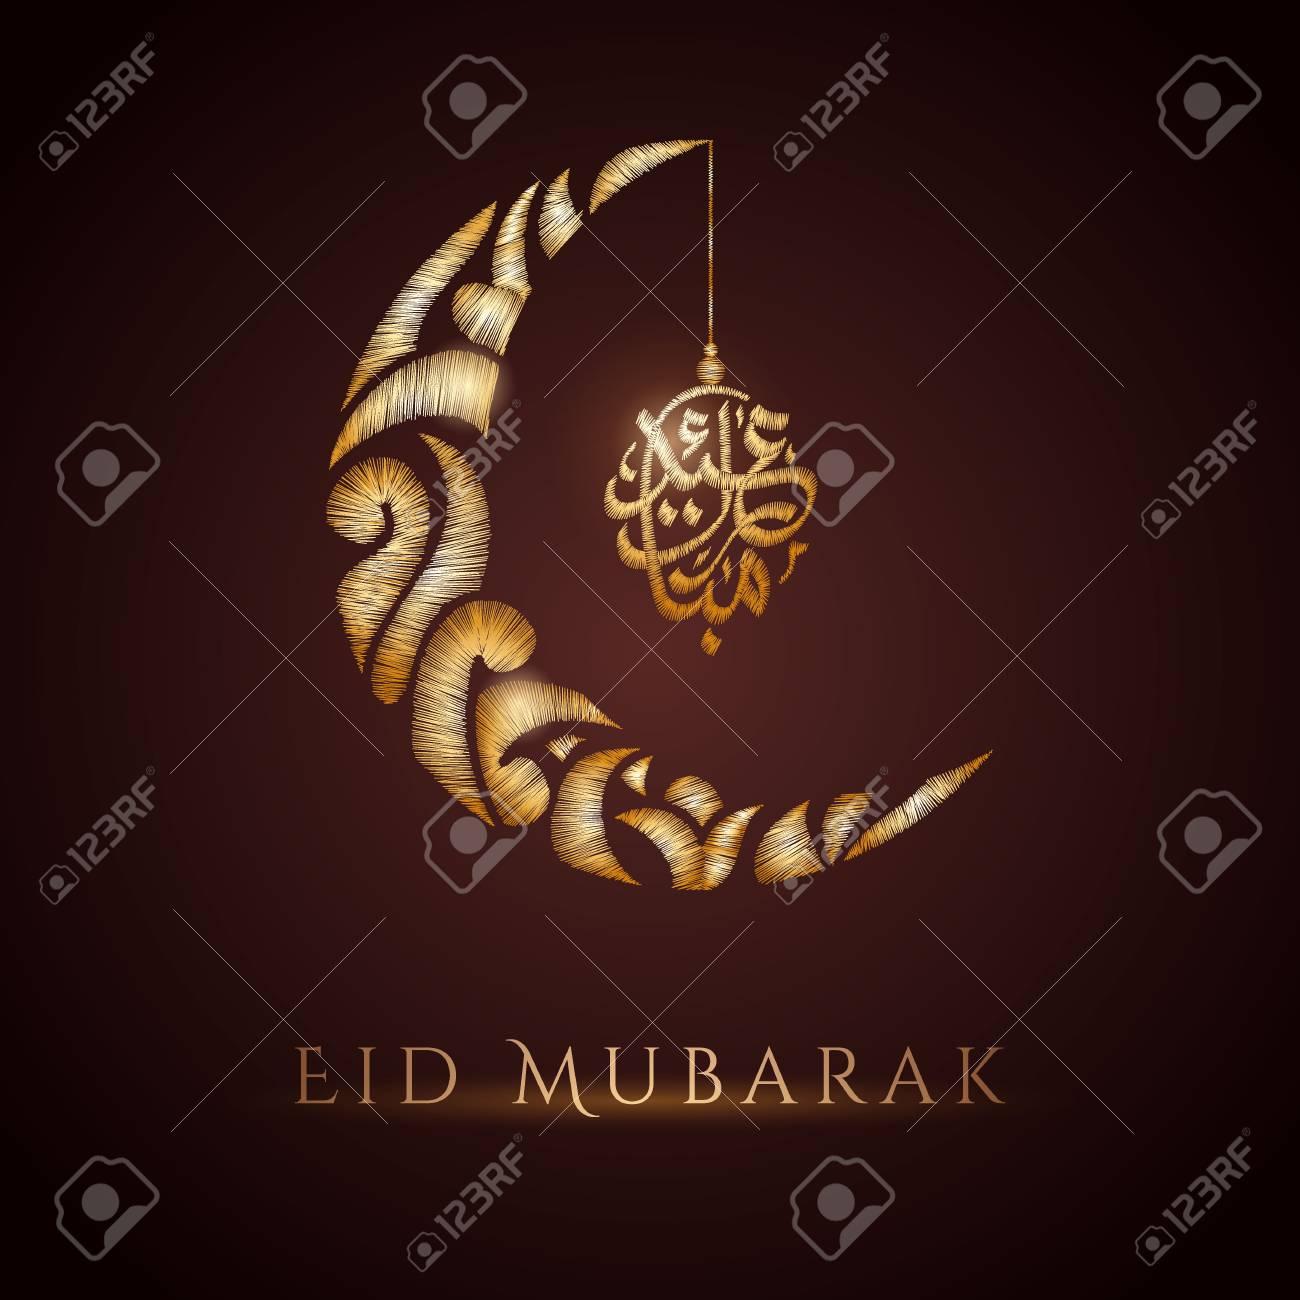 Eid mubarak greeting card background royalty free cliparts vectors eid mubarak greeting card background stock vector 100933678 m4hsunfo